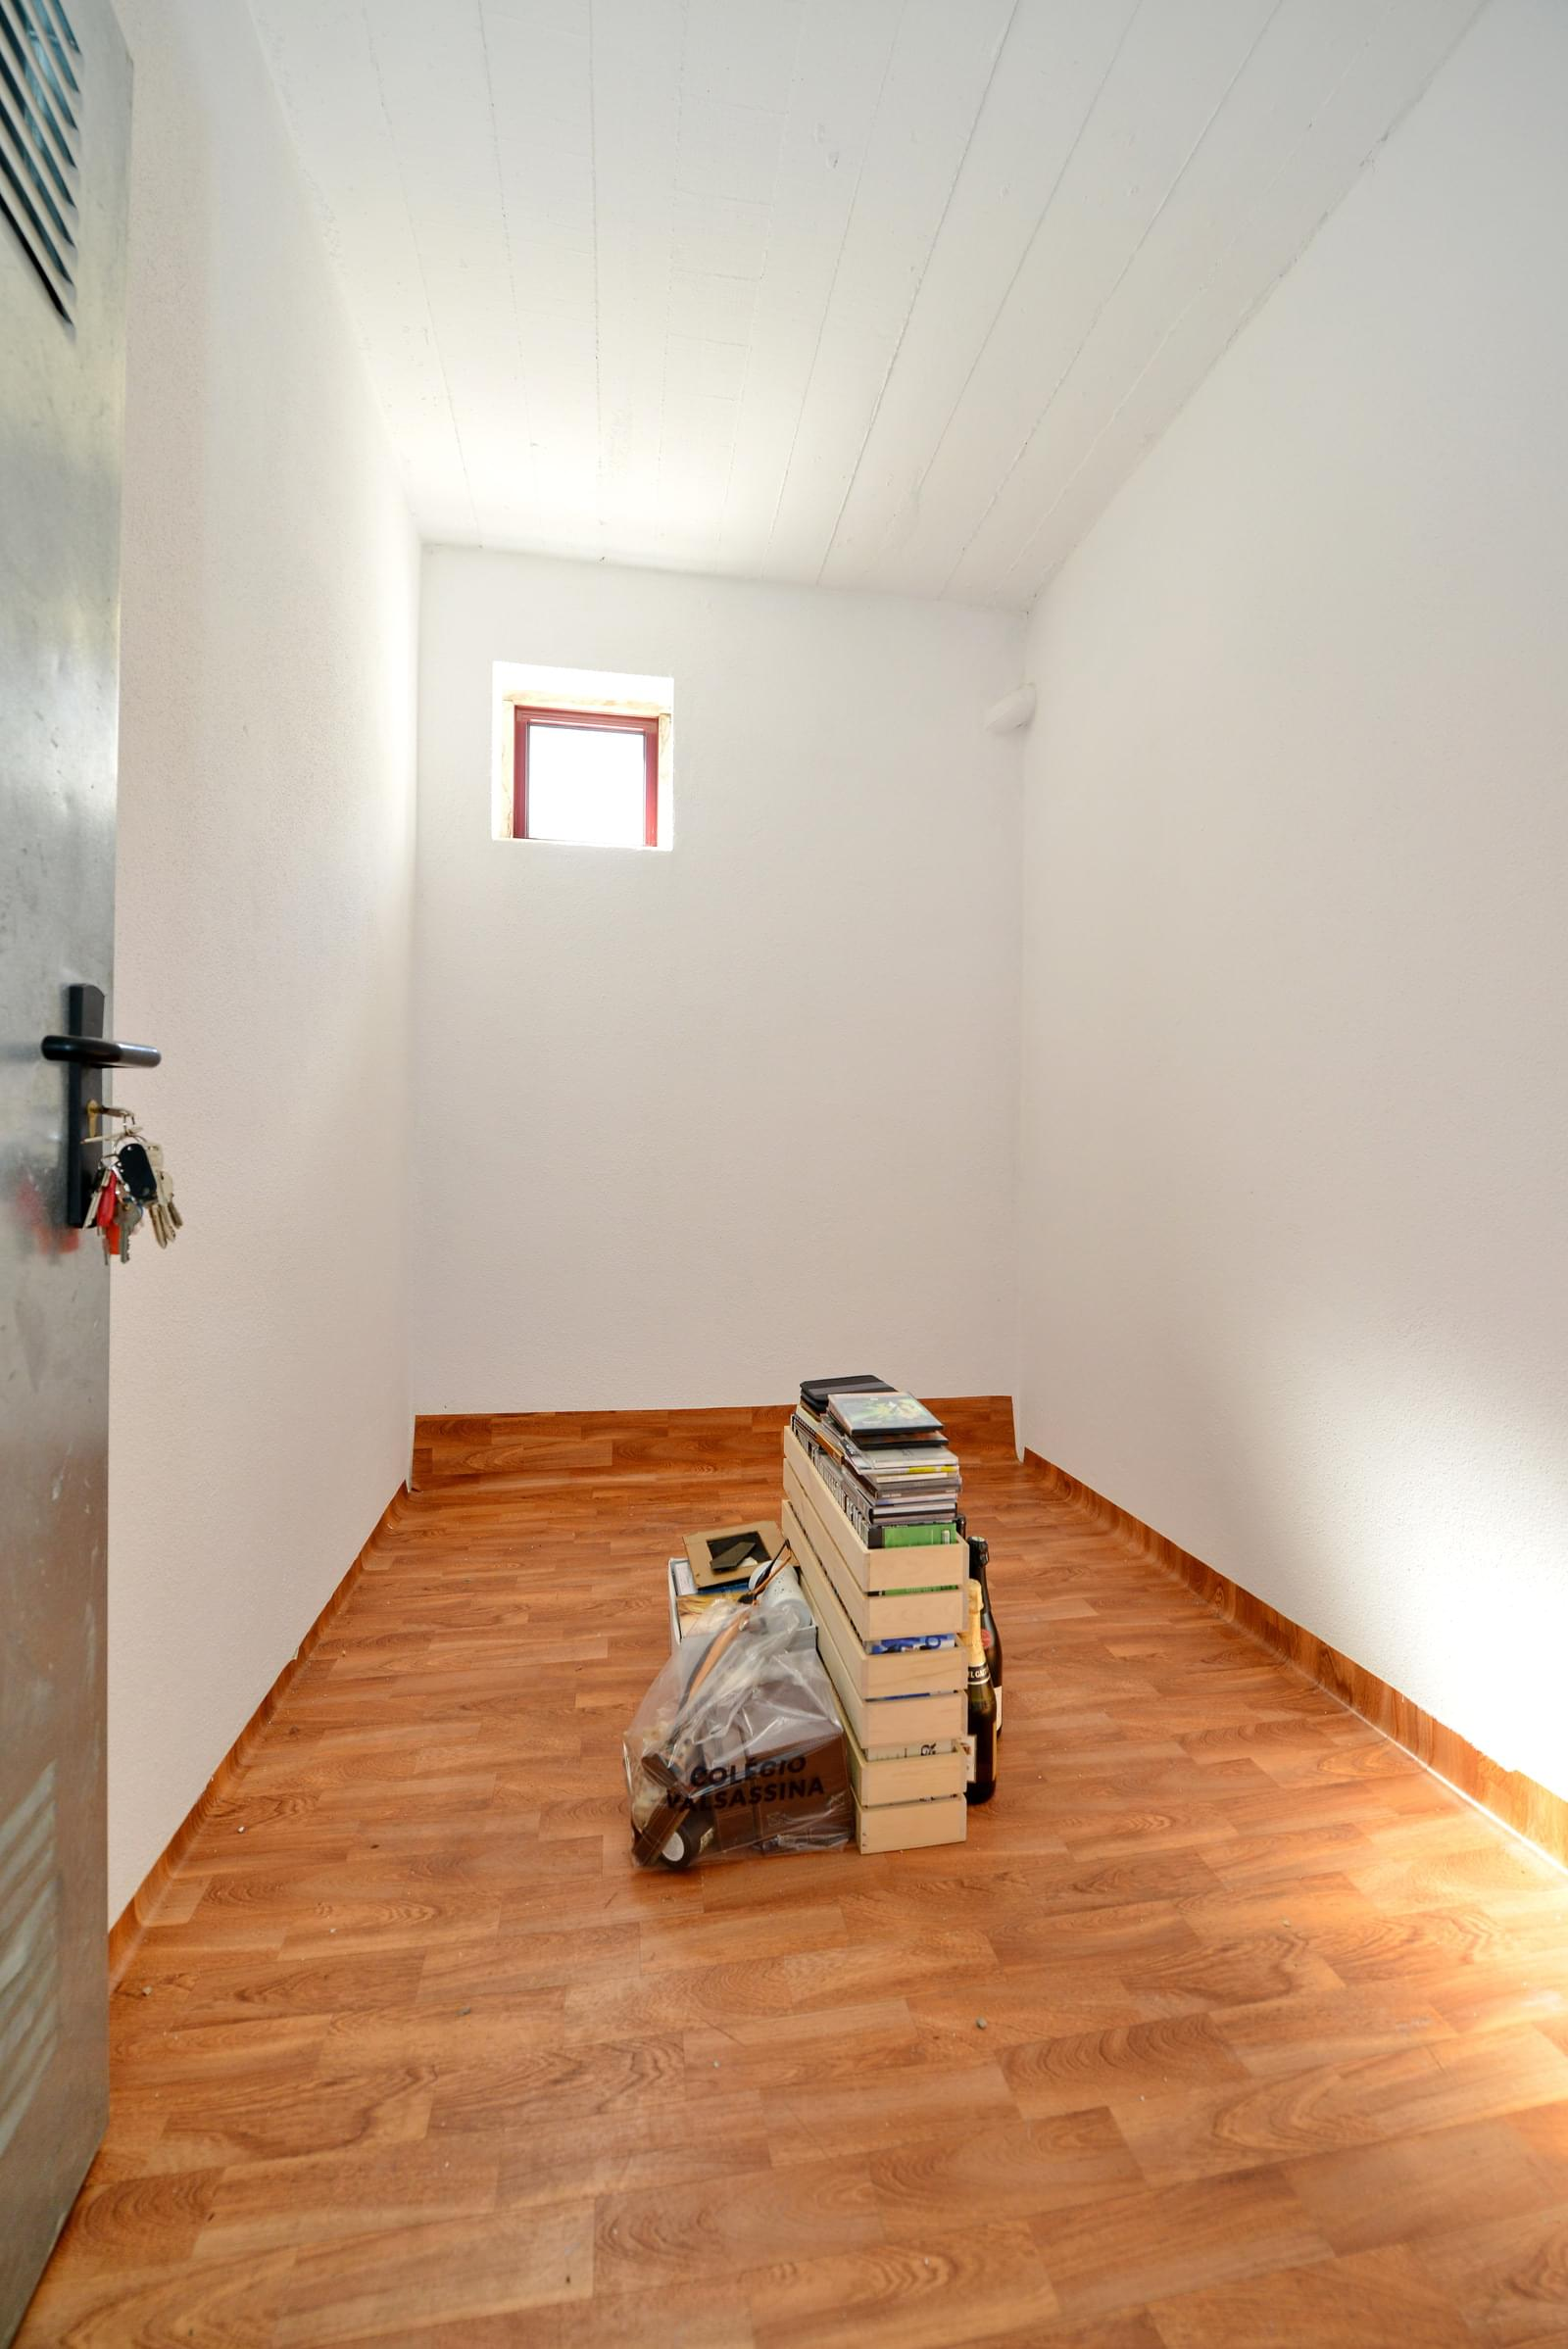 pf17174-apartamento-t3-oeiras-e3157242-701b-42b3-9d4b-dee055c6b6b1